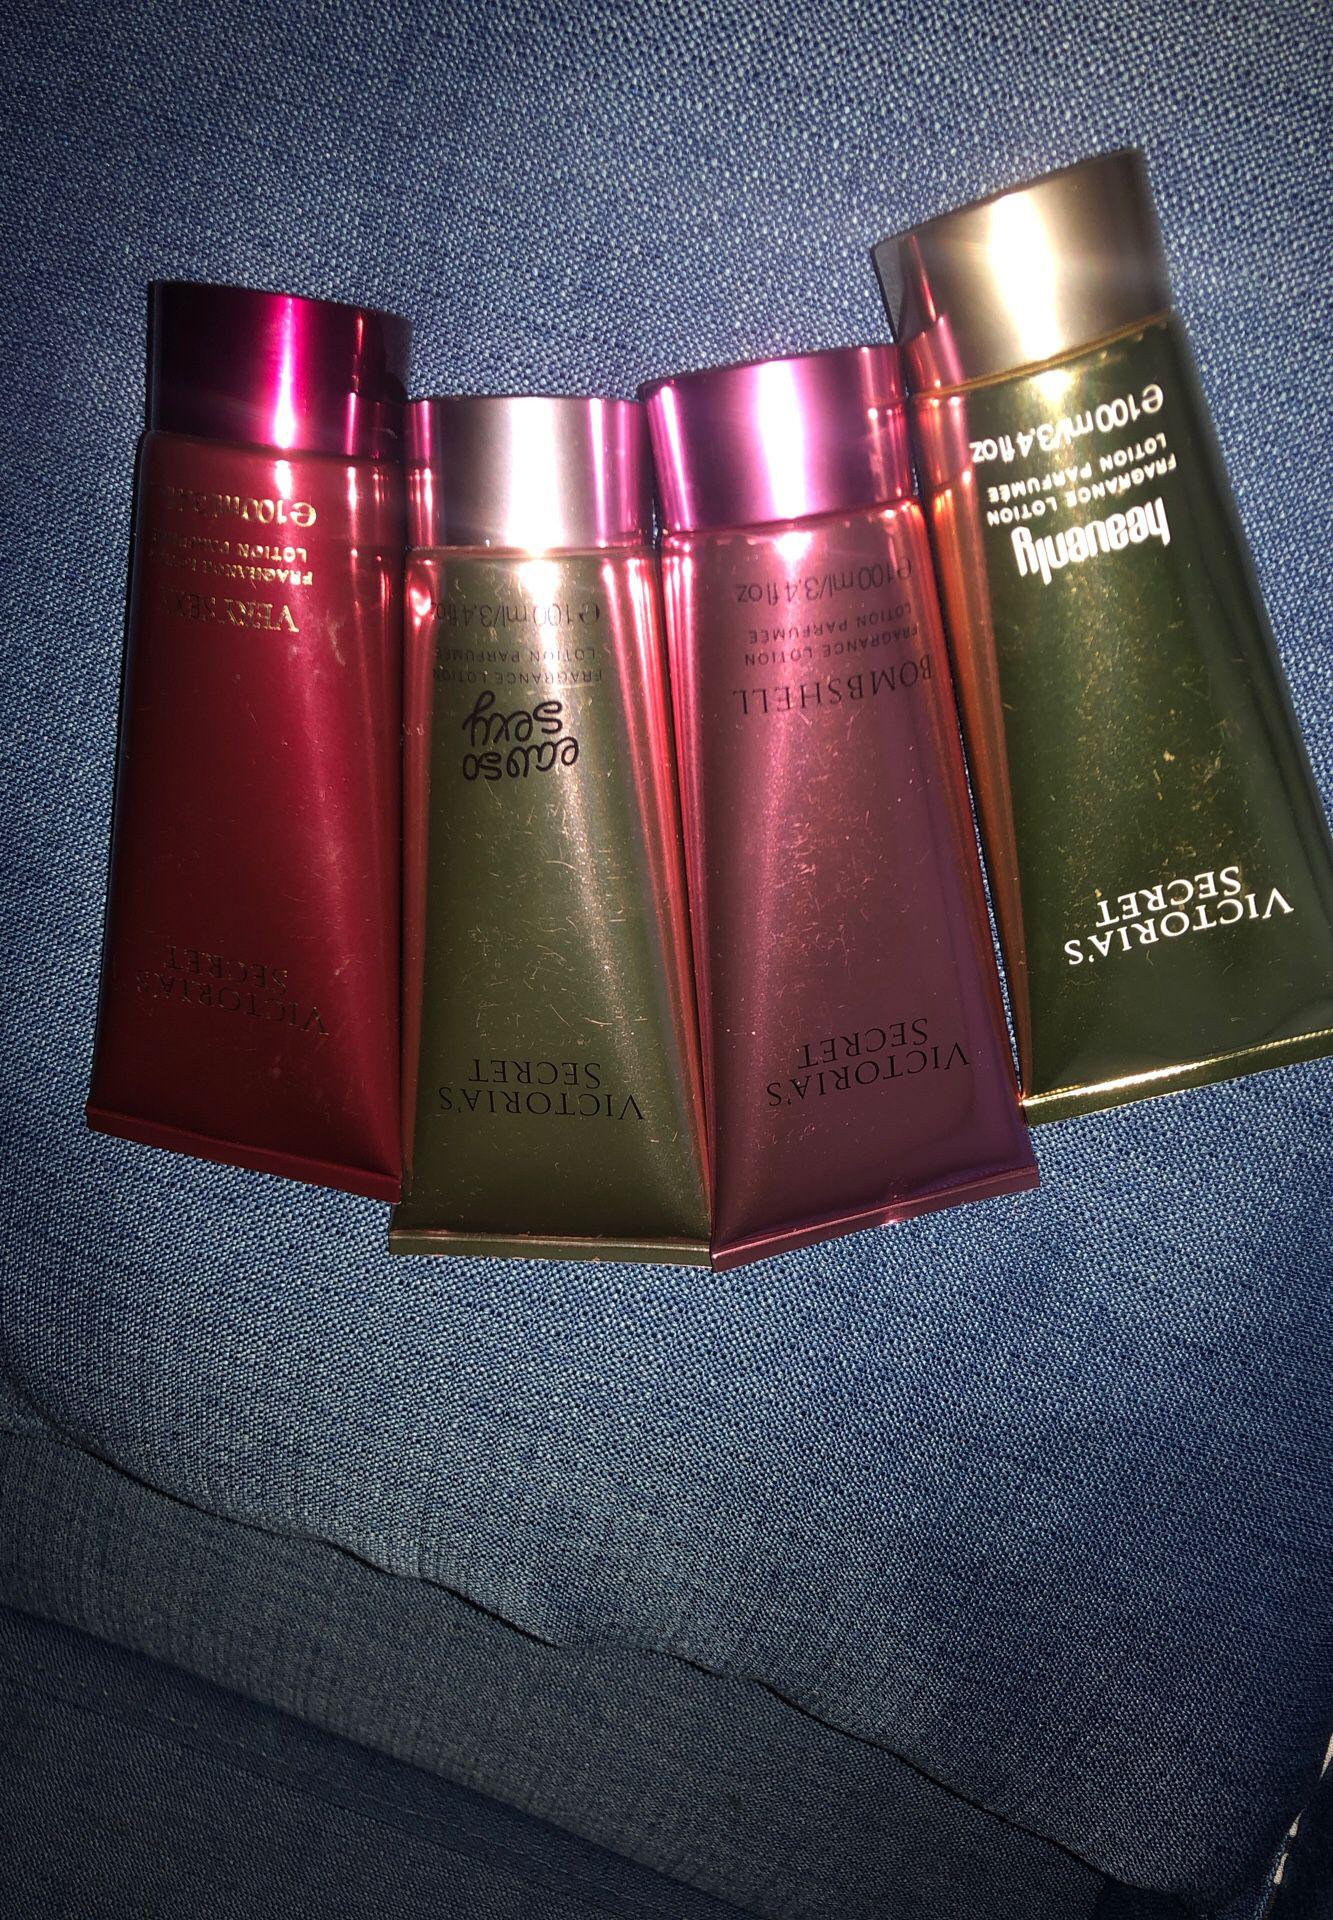 Victoria's Secret lotions